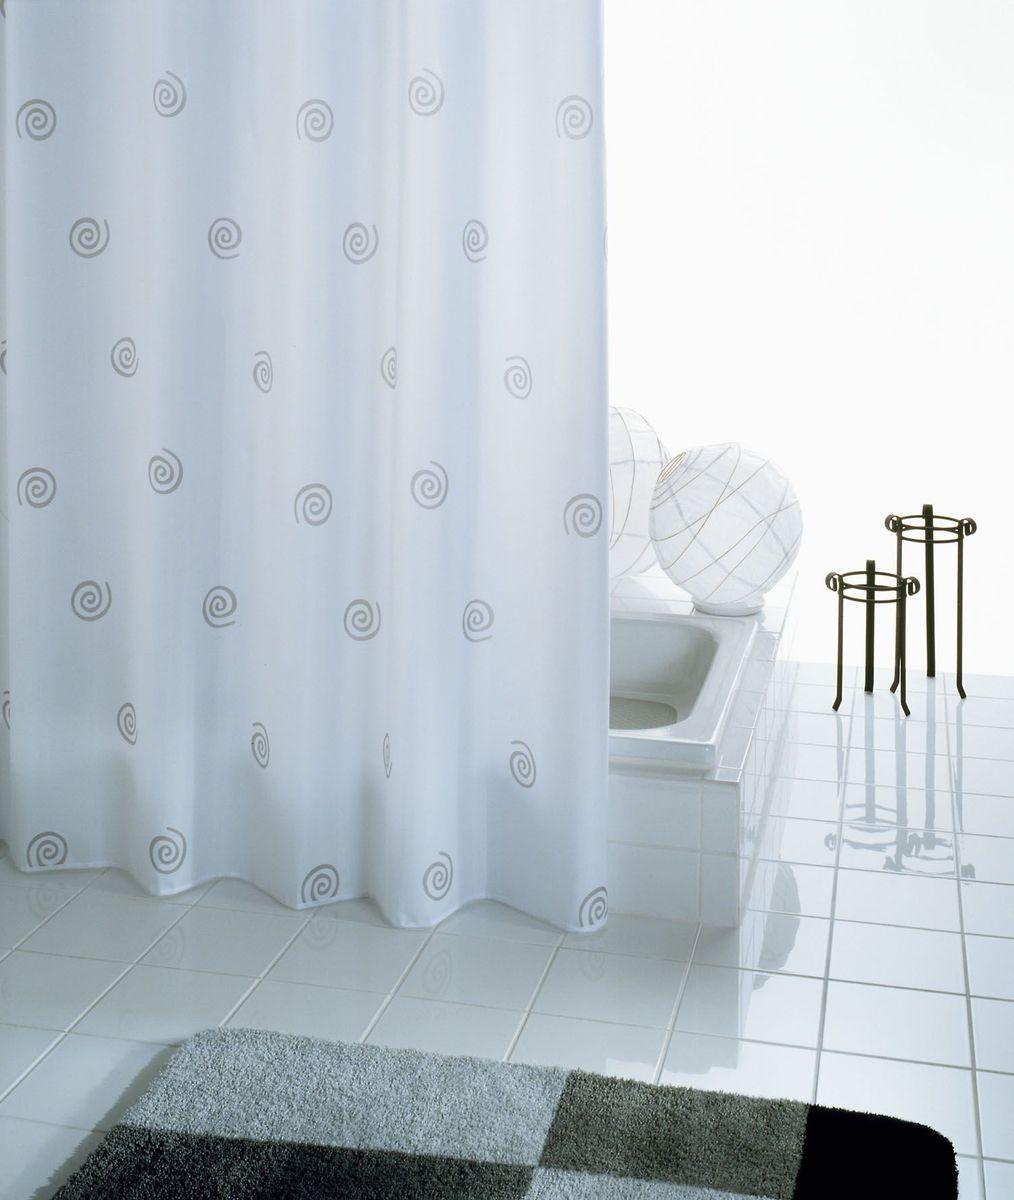 Штора для ванной комнаты Ridder Univers, цвет: белый, 180 х 200 см штора для ванной комнаты ridder helgoland цвет синий голубой 240 х 180 см